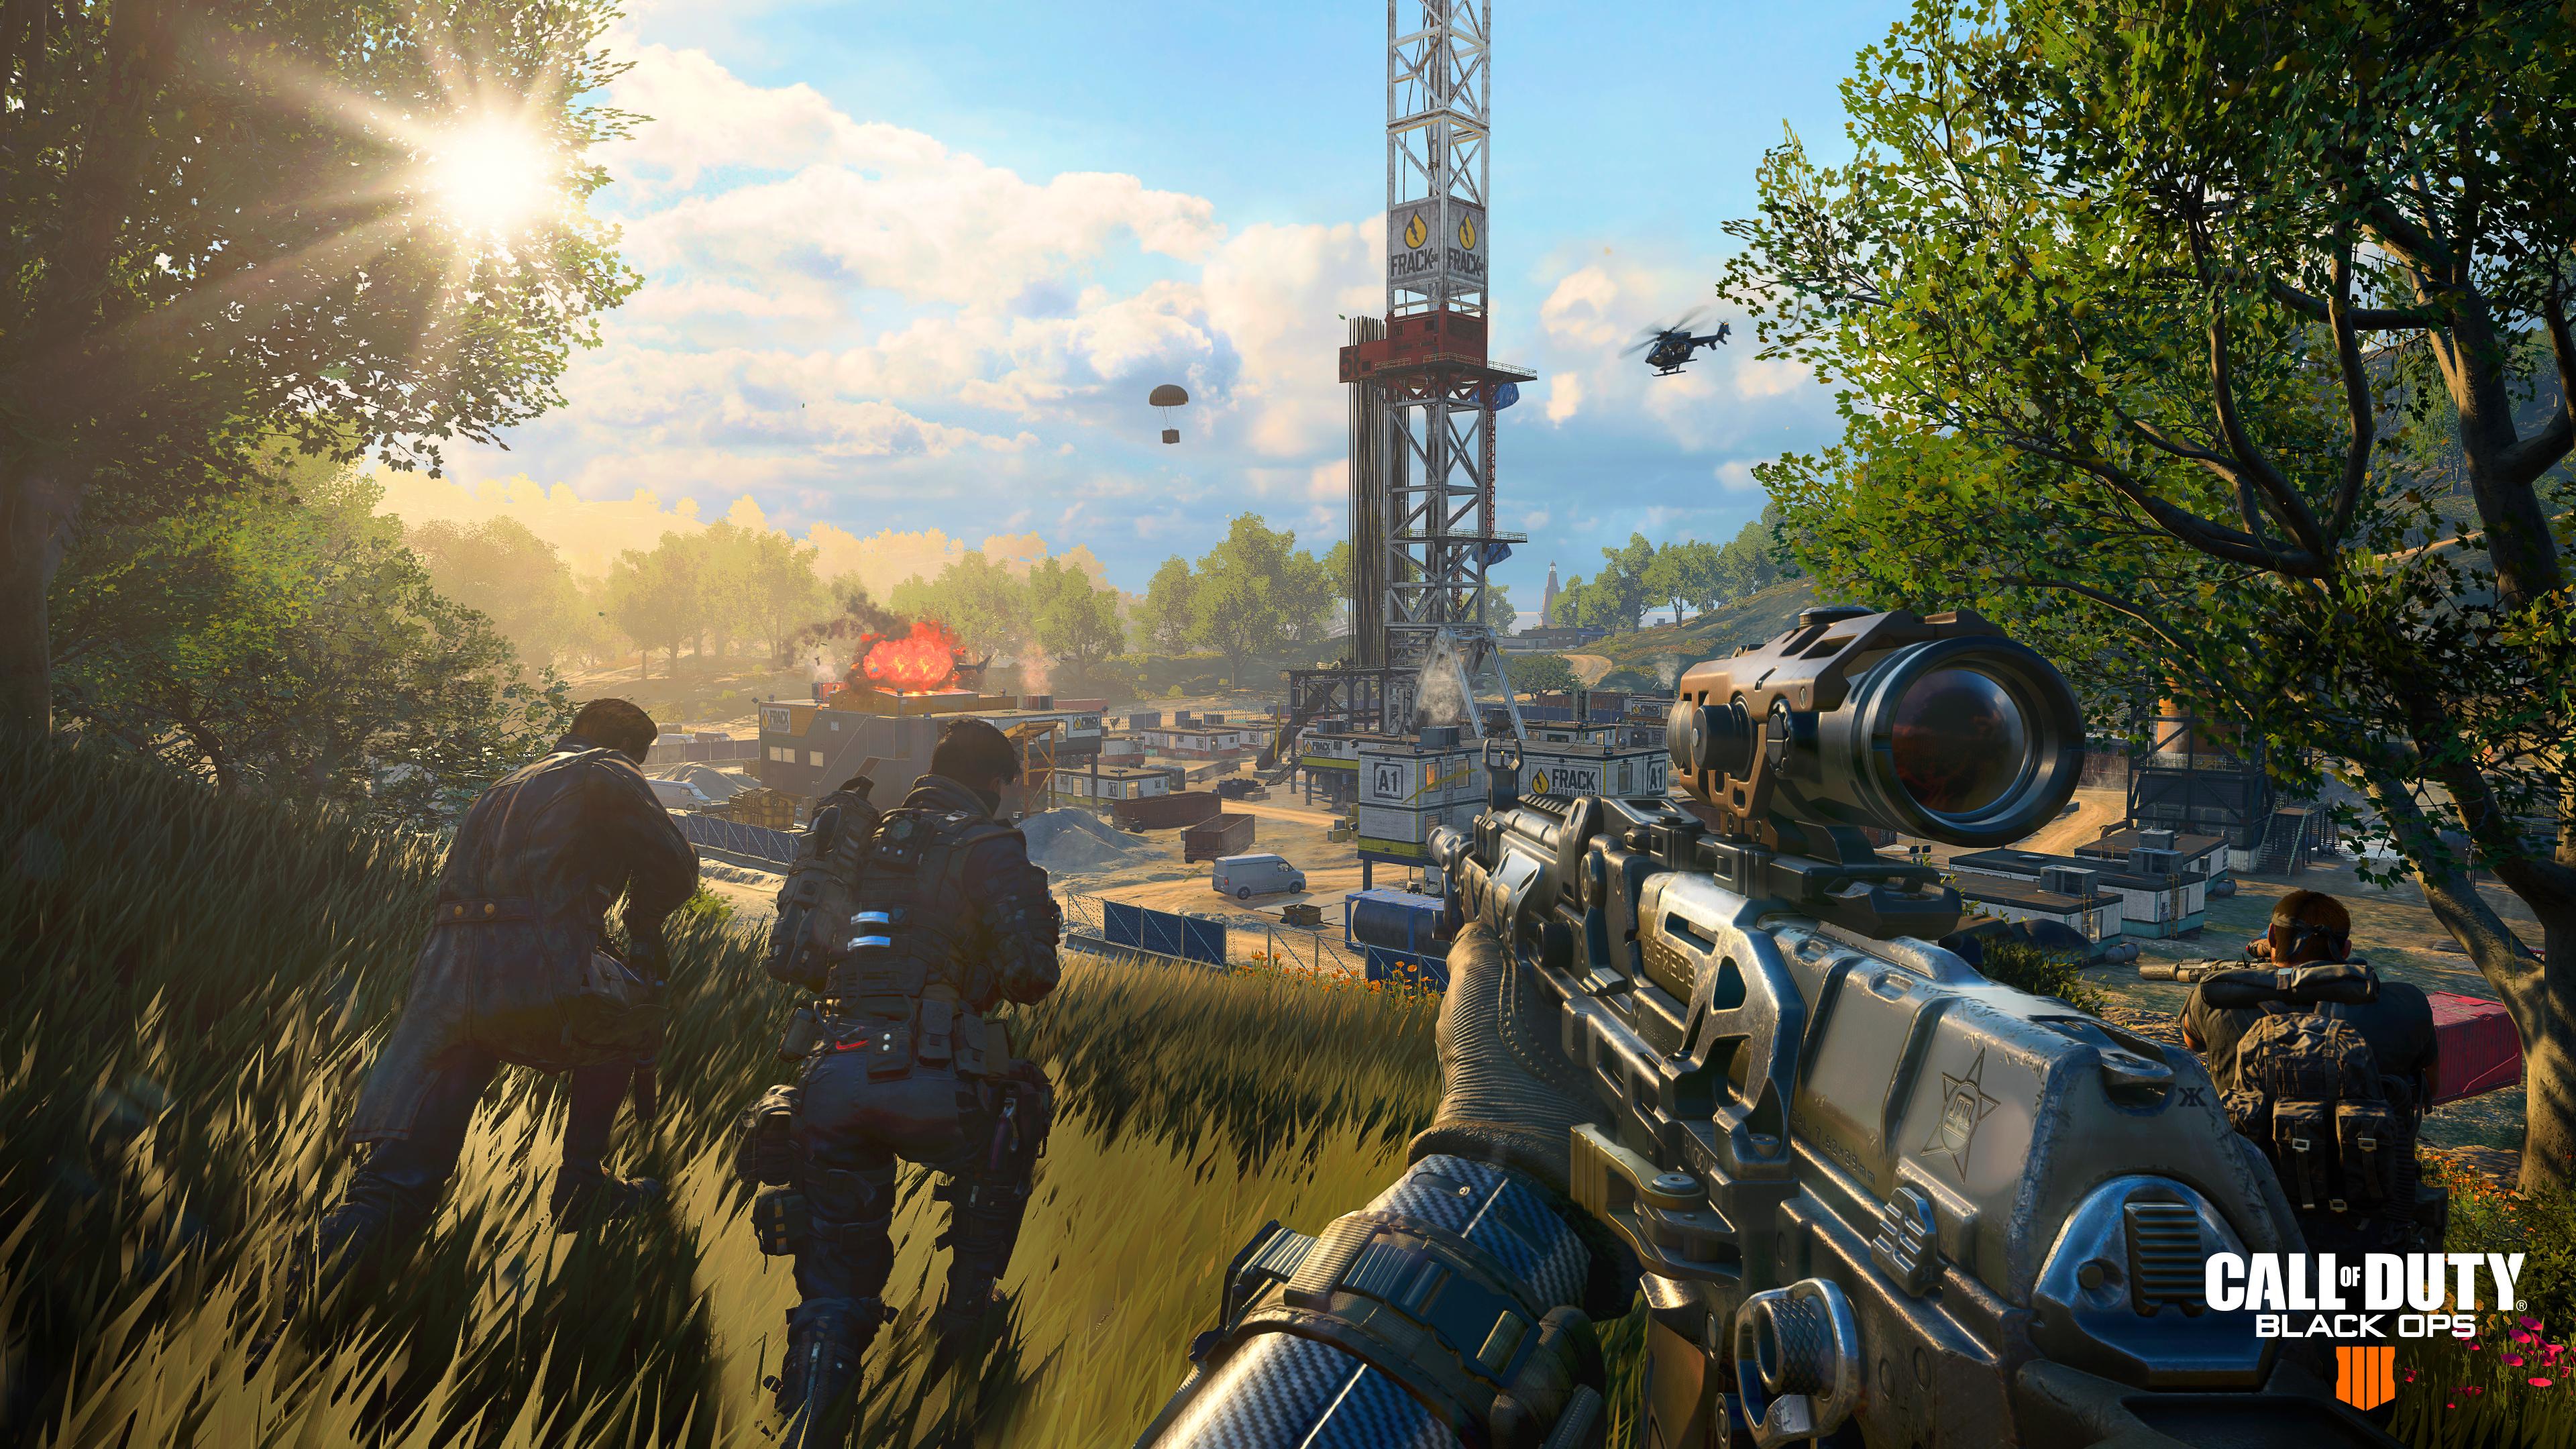 Activision Black Ops 4 - Blackout screenshot